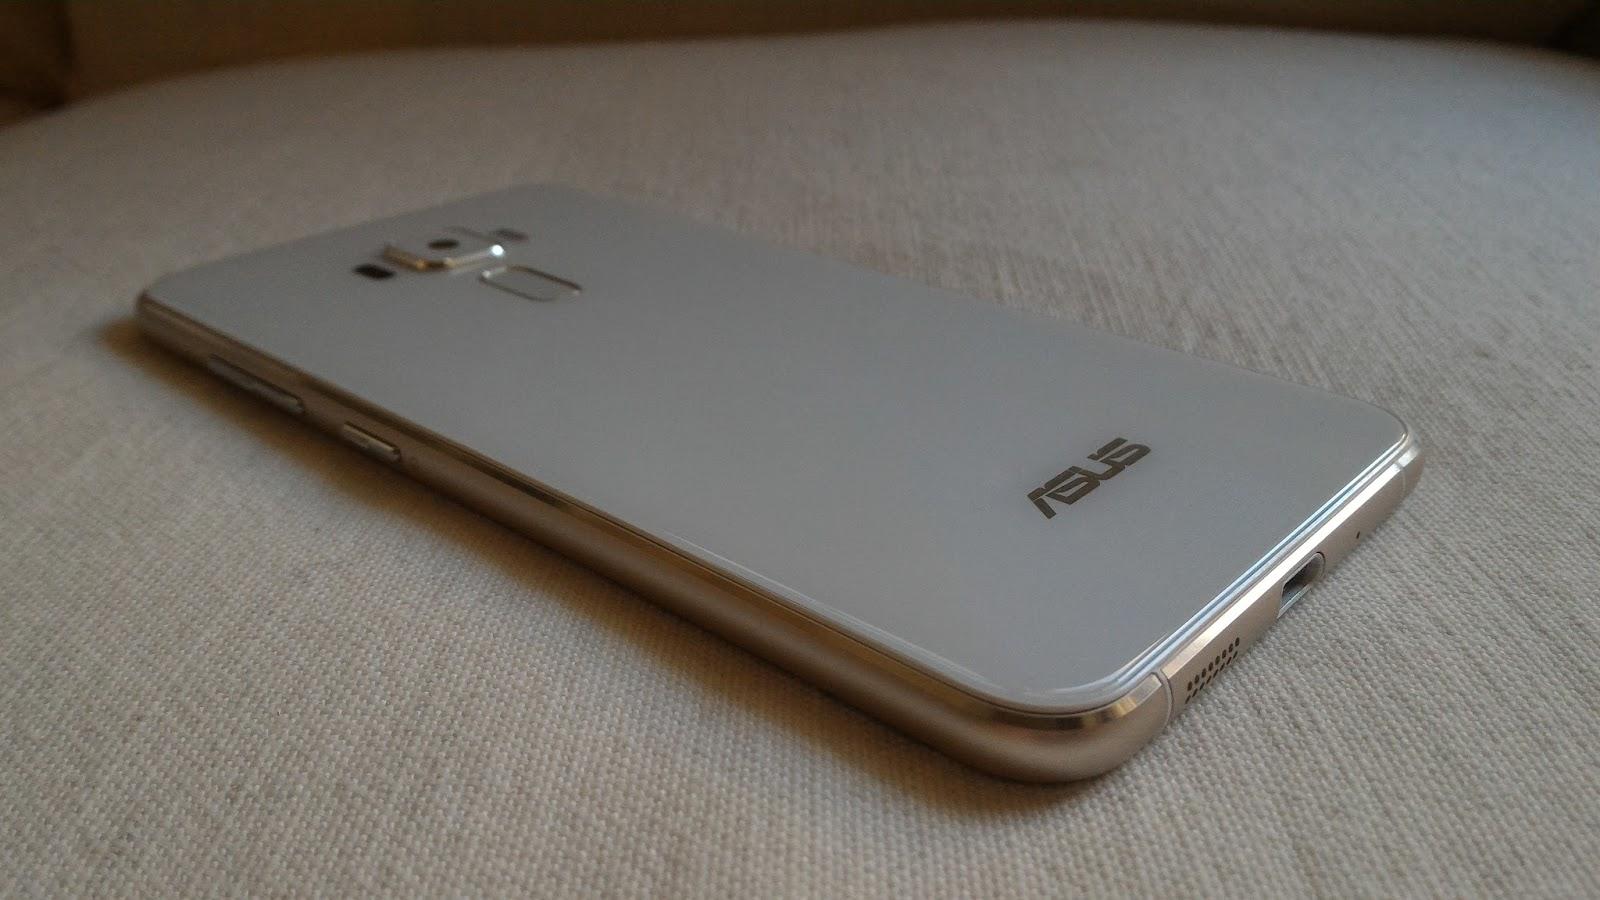 P 20170126 162358 - [開箱] 平價奢華 Zenfone 3 ZE552KL 月光白 4G/64G,外型大進化、CP值破表!